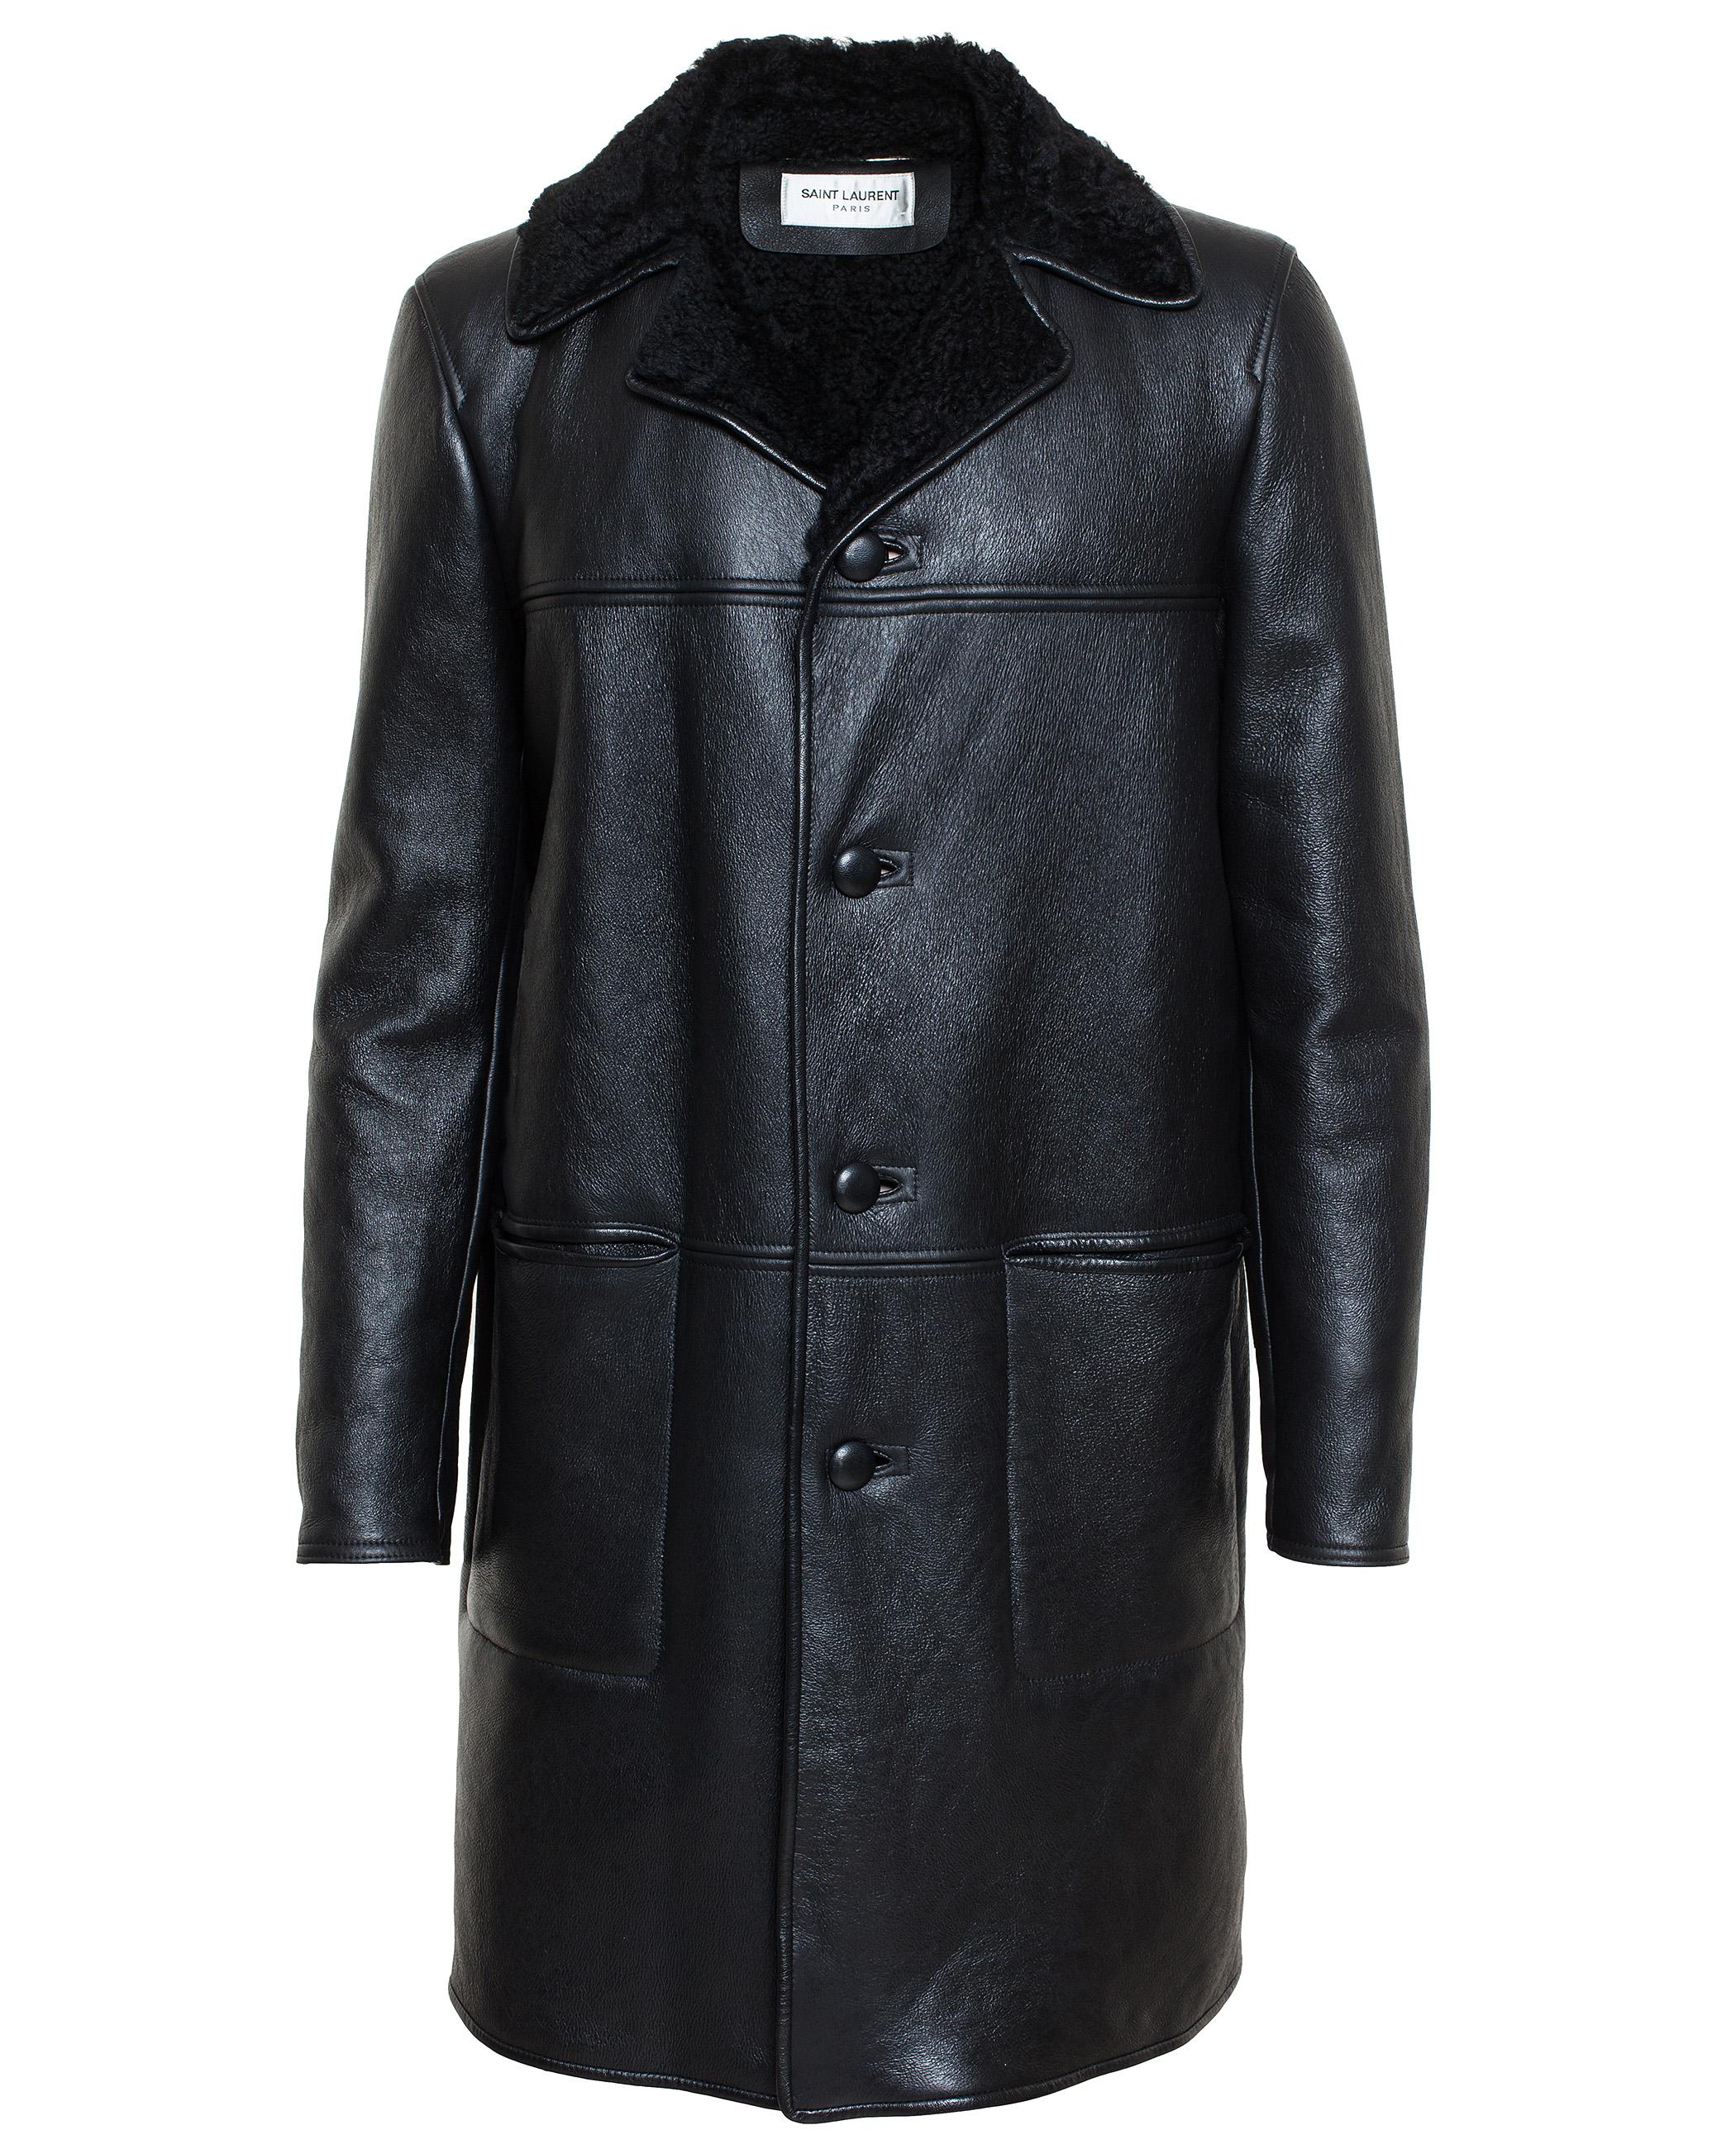 Saint laurent Lamb Leather Shearling Coat in Black | Lyst